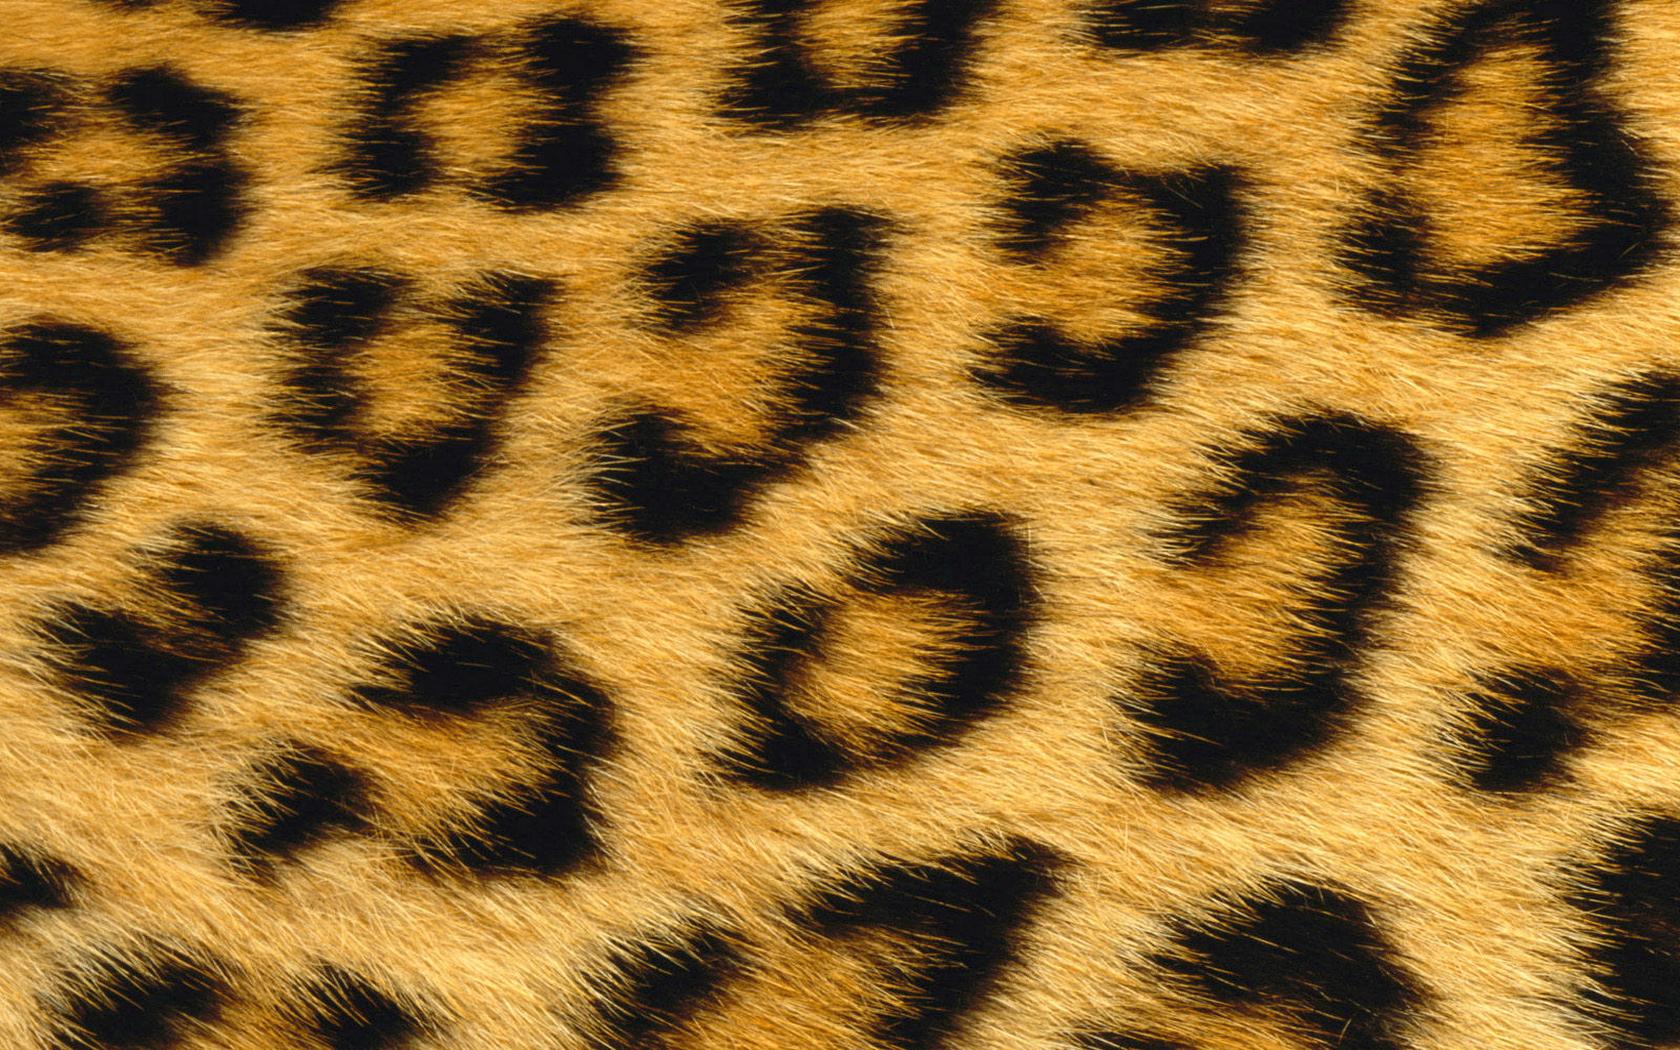 external image leopard skin wallpapers 6276 1680x1050jpg 1680x1050